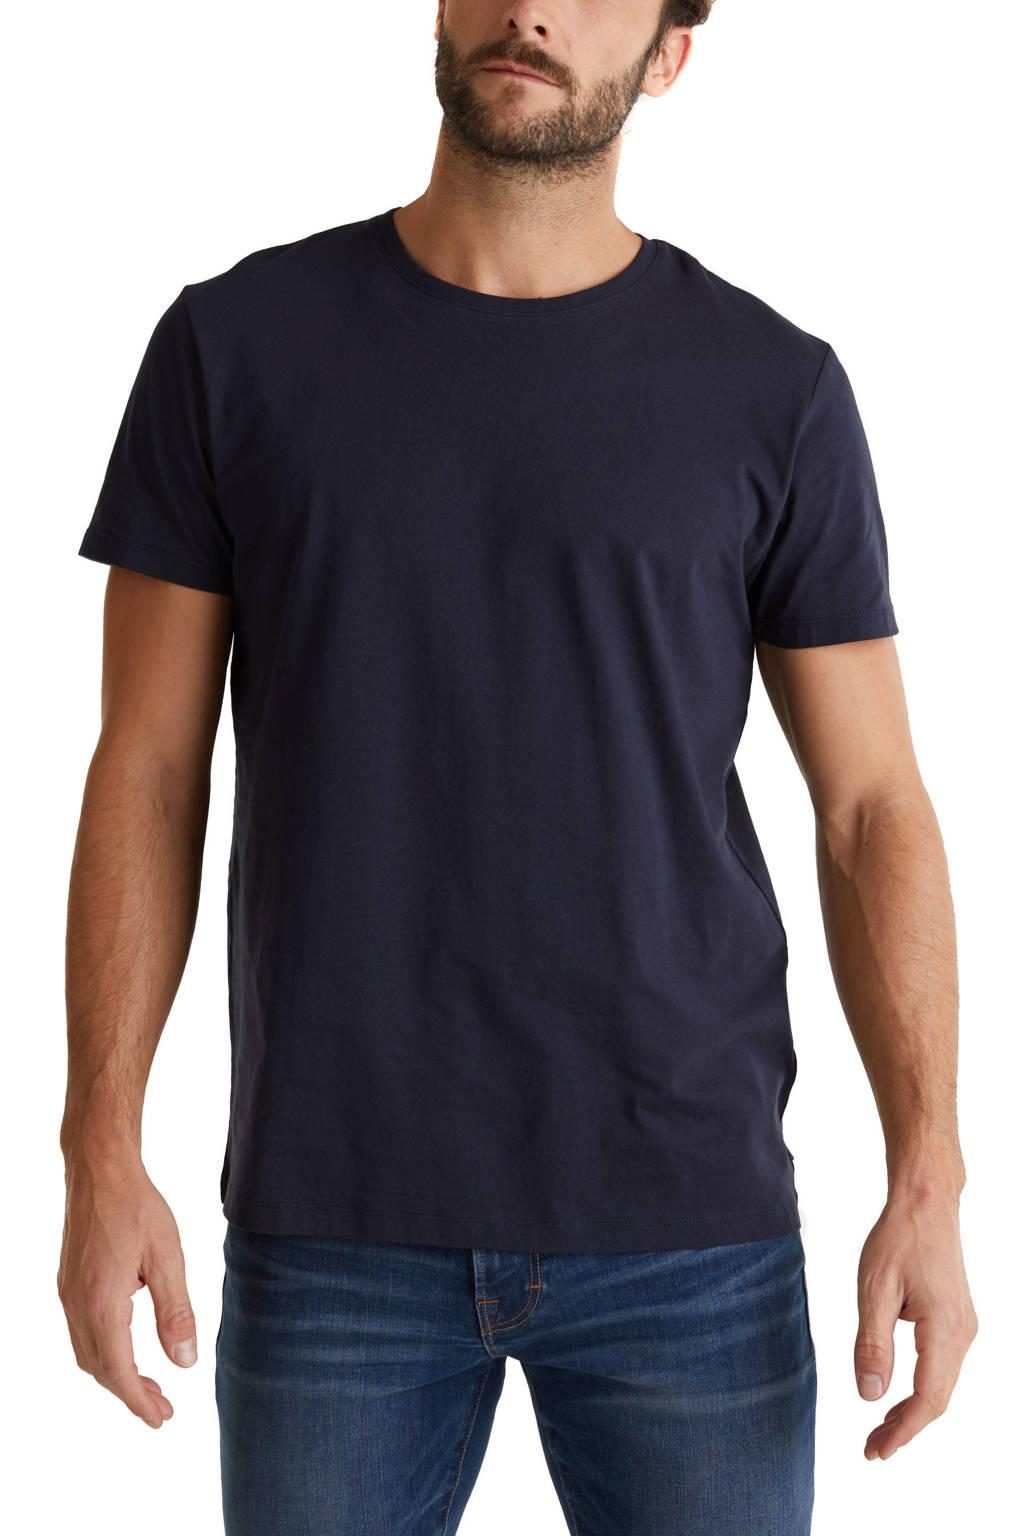 ESPRIT Men Casual T-shirt donkerblauw, Donkerblauw